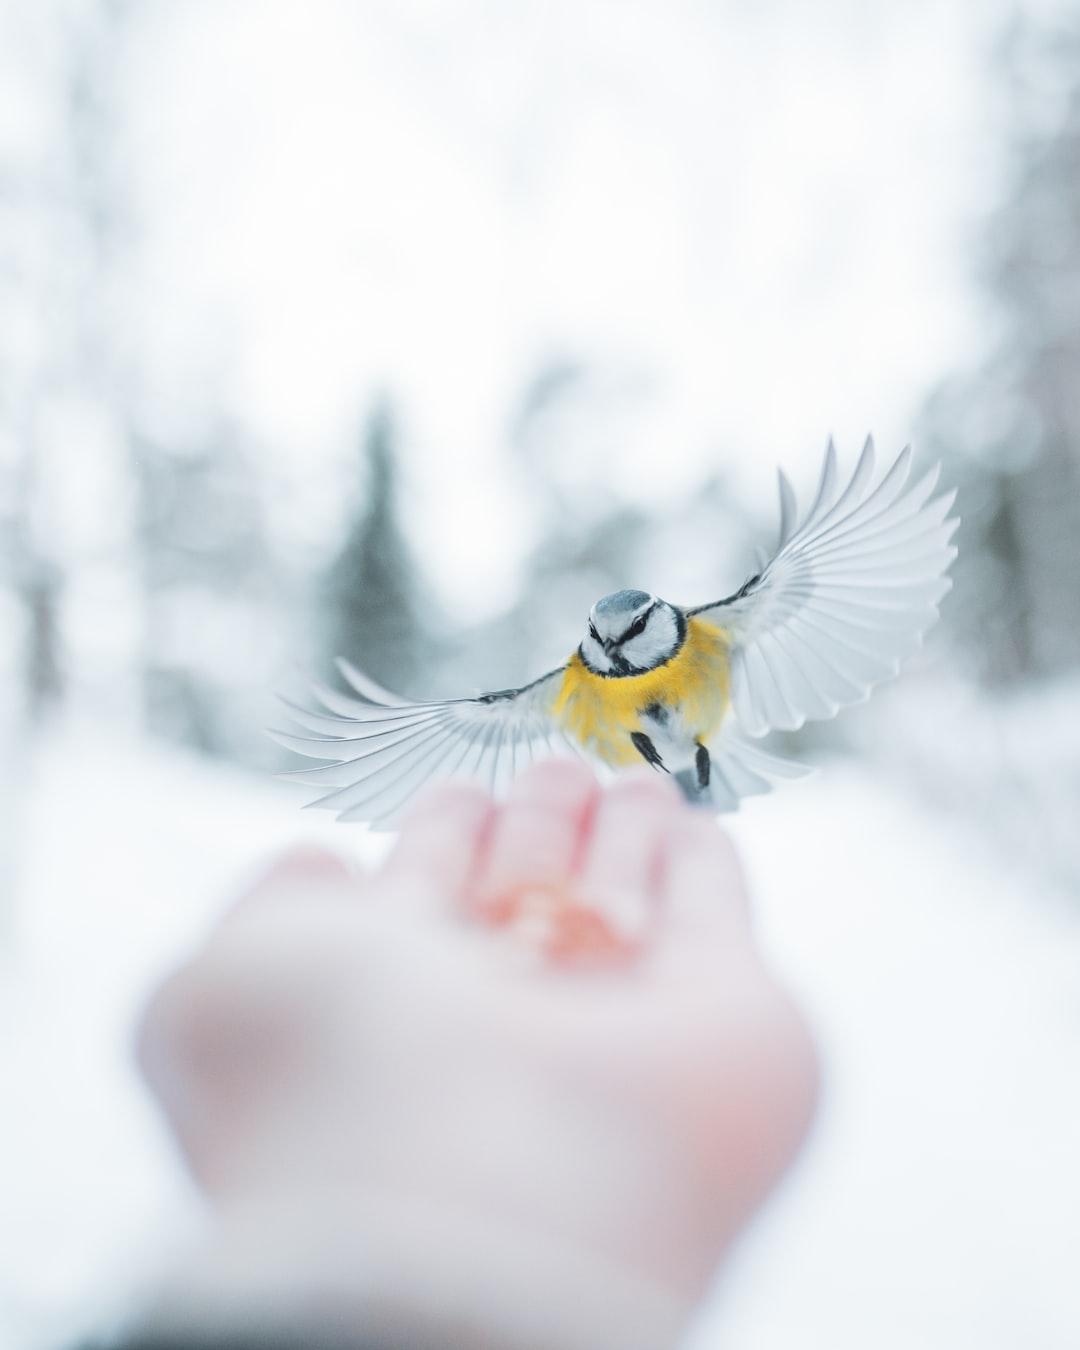 Feel the nature  Bird whispering